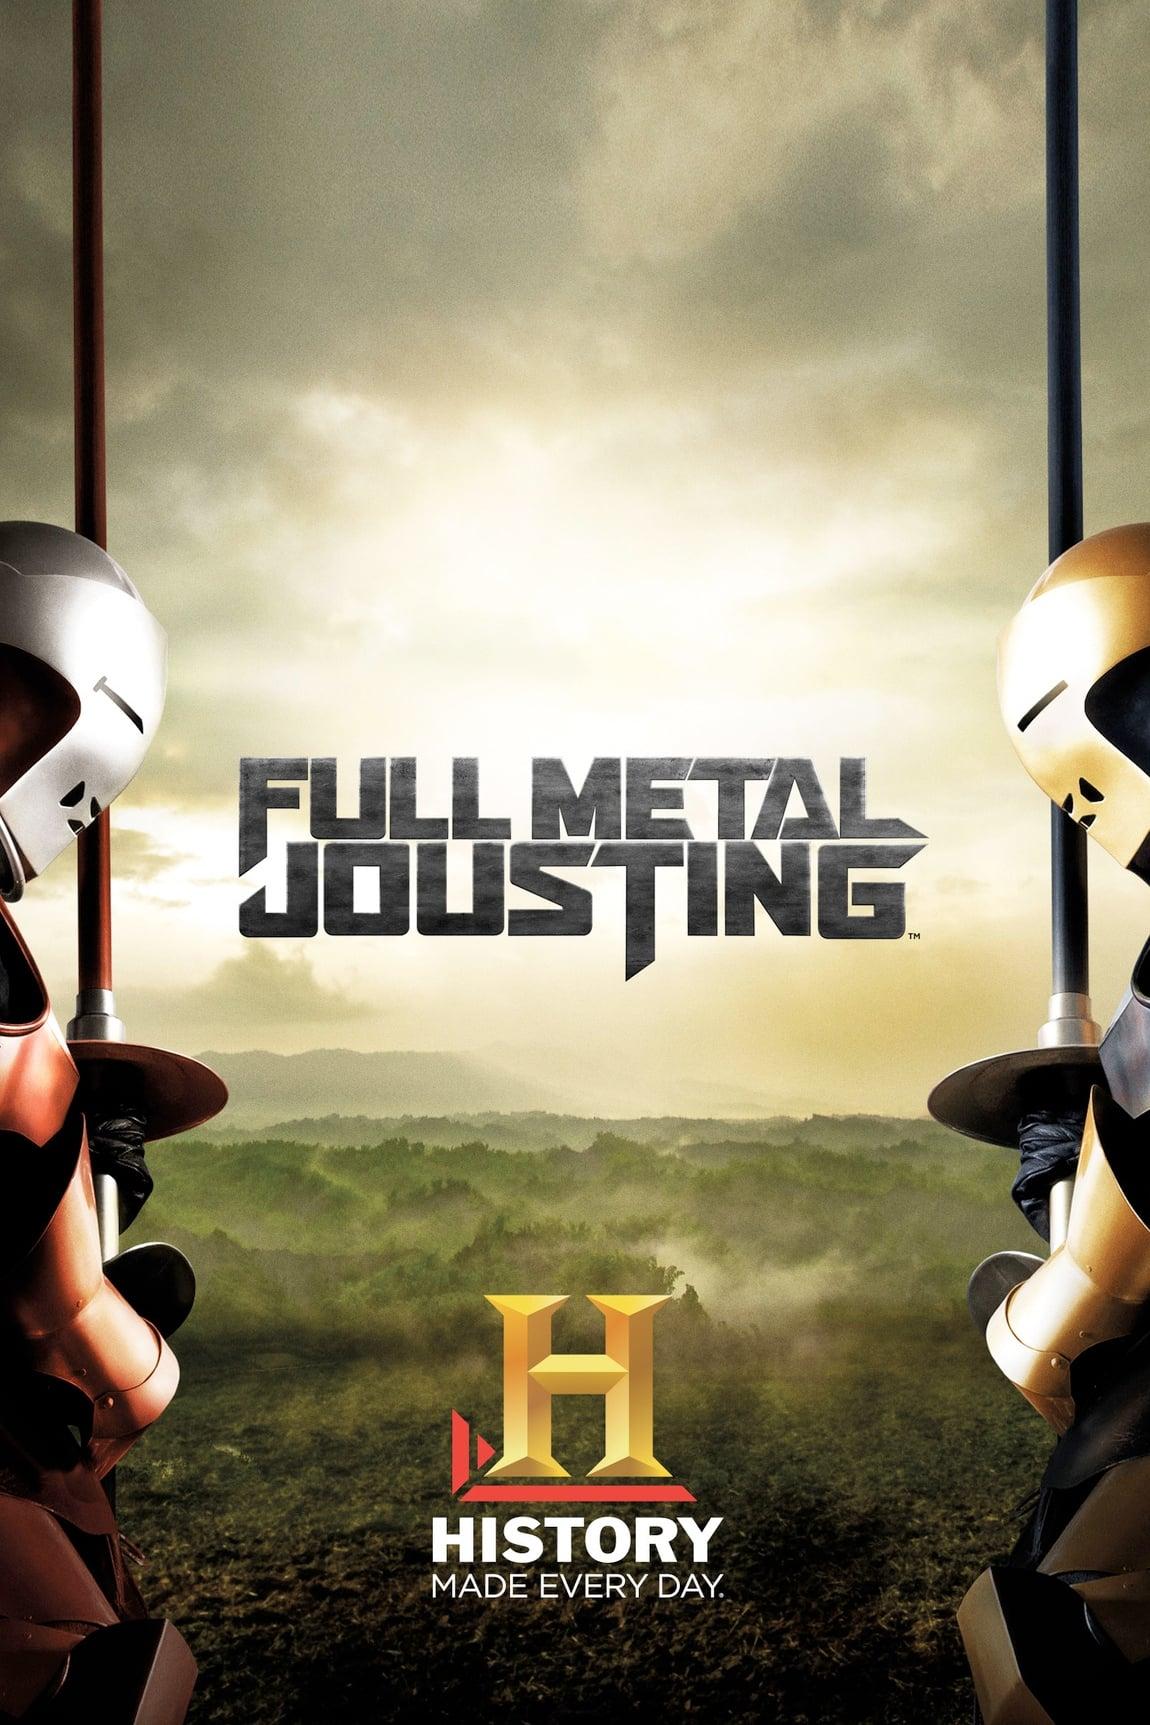 Full Metal Jousting (2012)